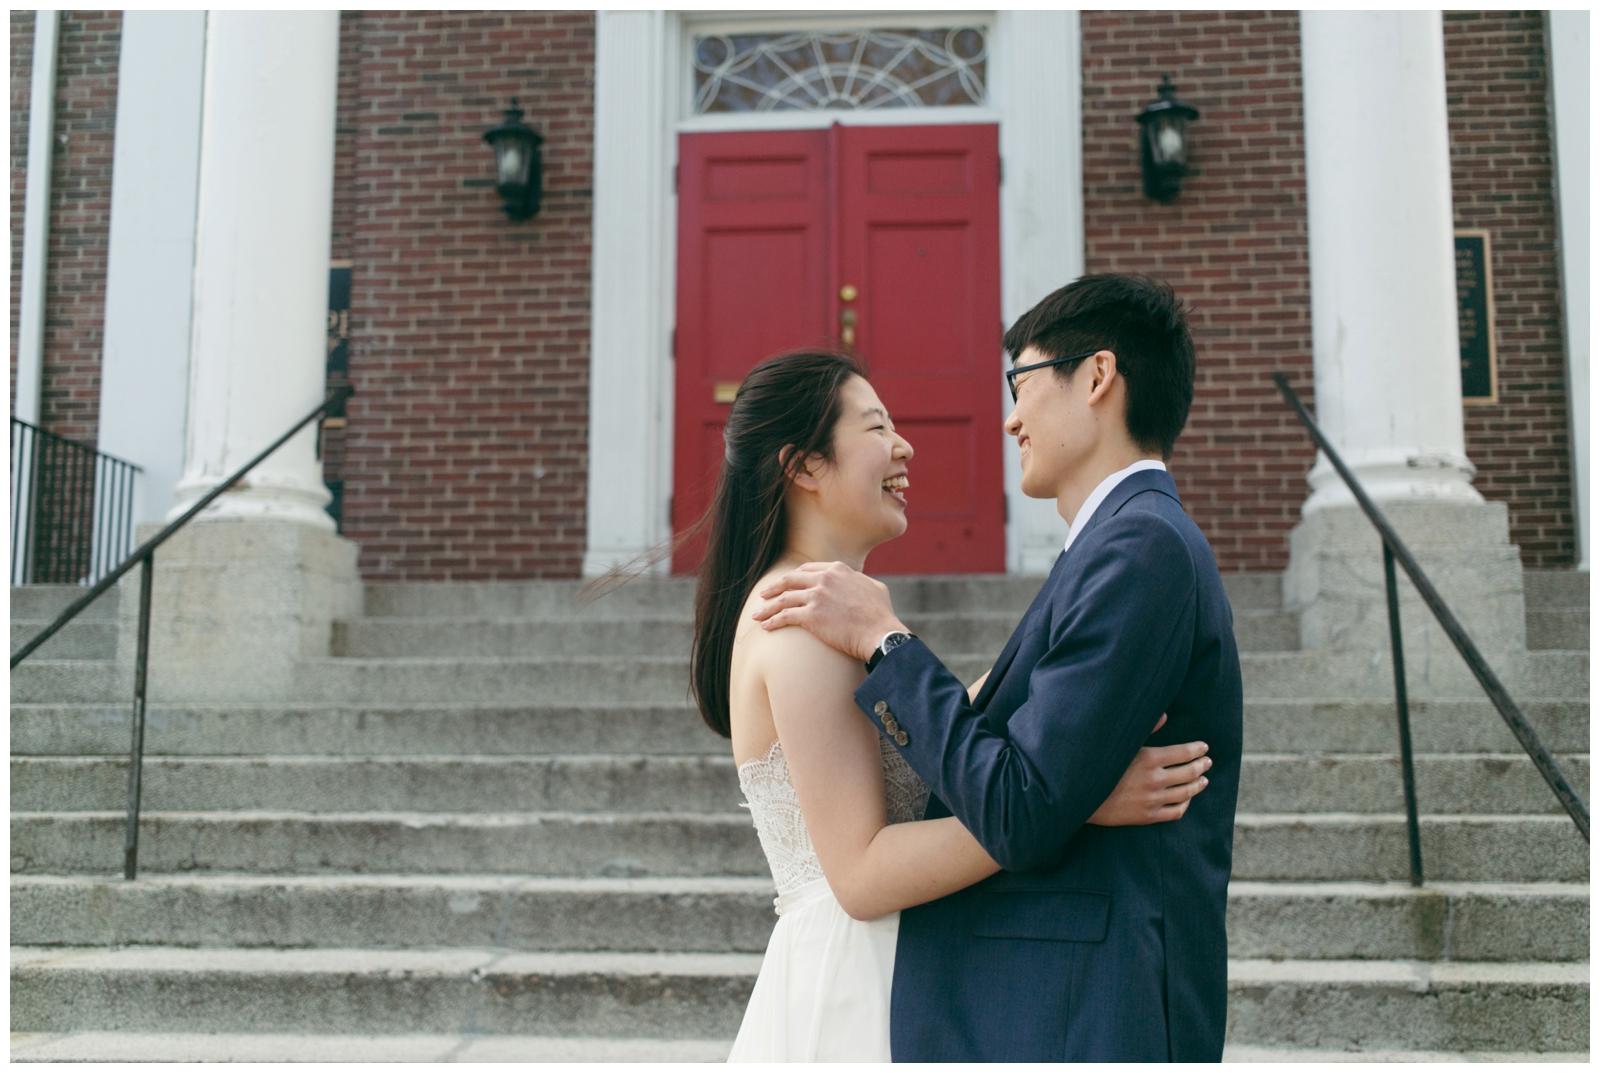 Samberg-Conference-Center-Boston-Wedding-Photographer-Bailey-Q-Photo-027.jpg